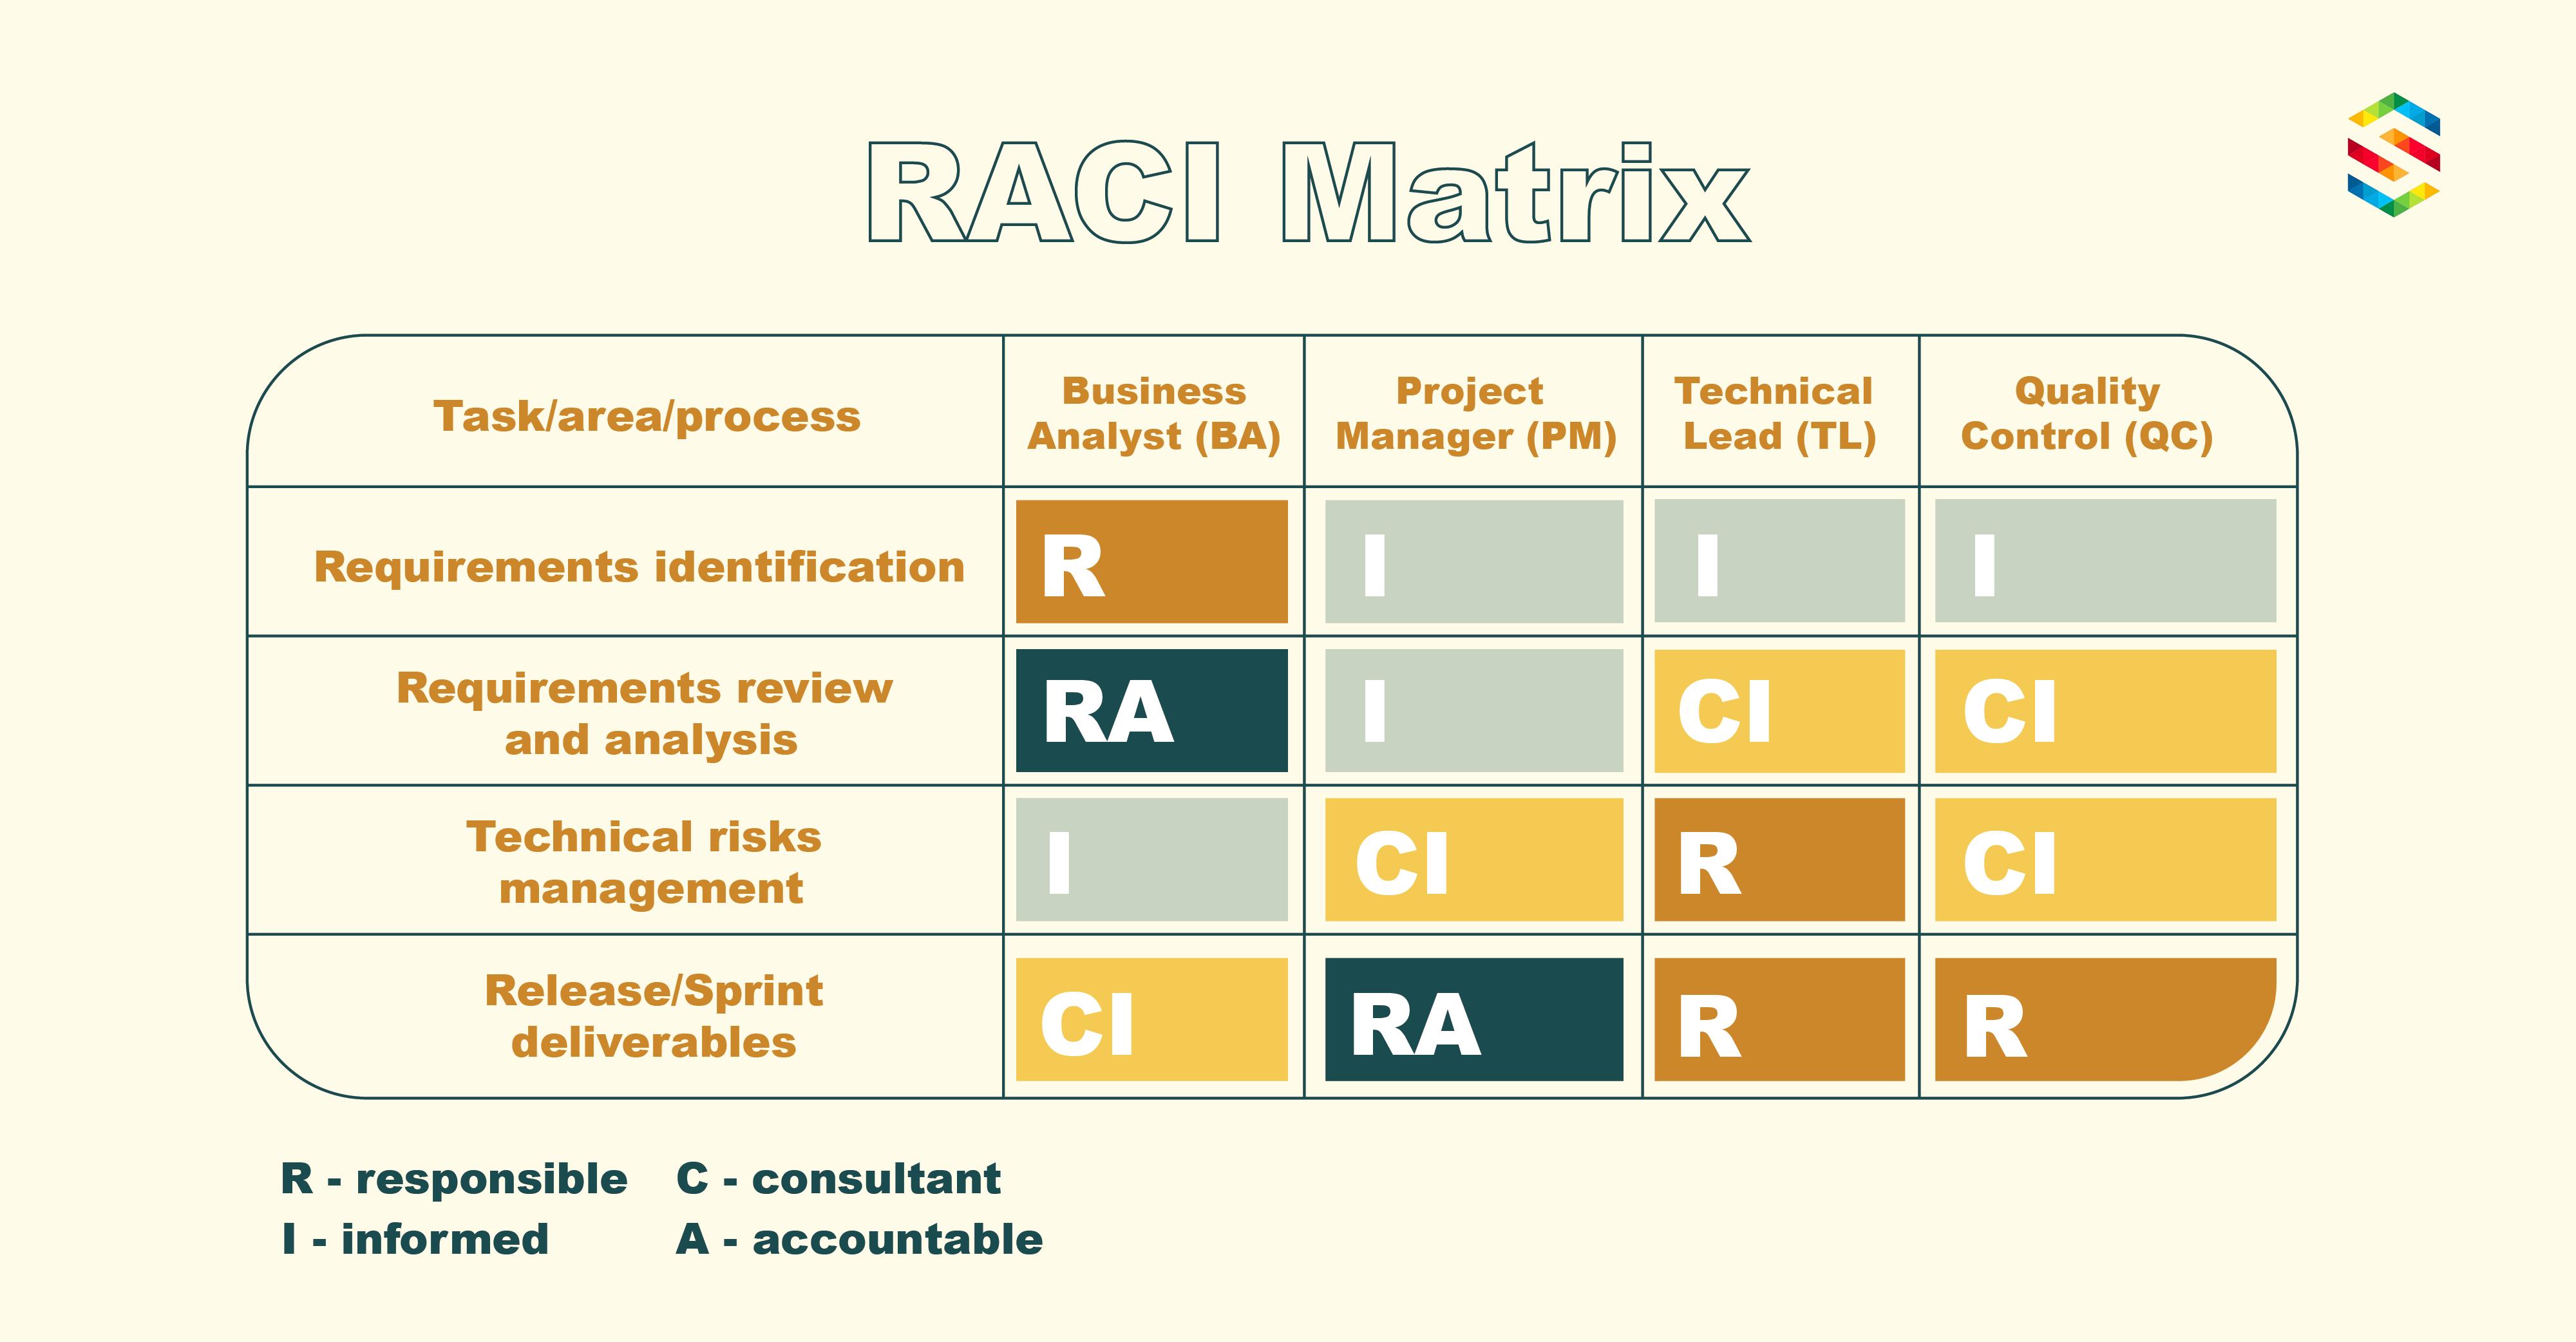 RACI matrix in project management